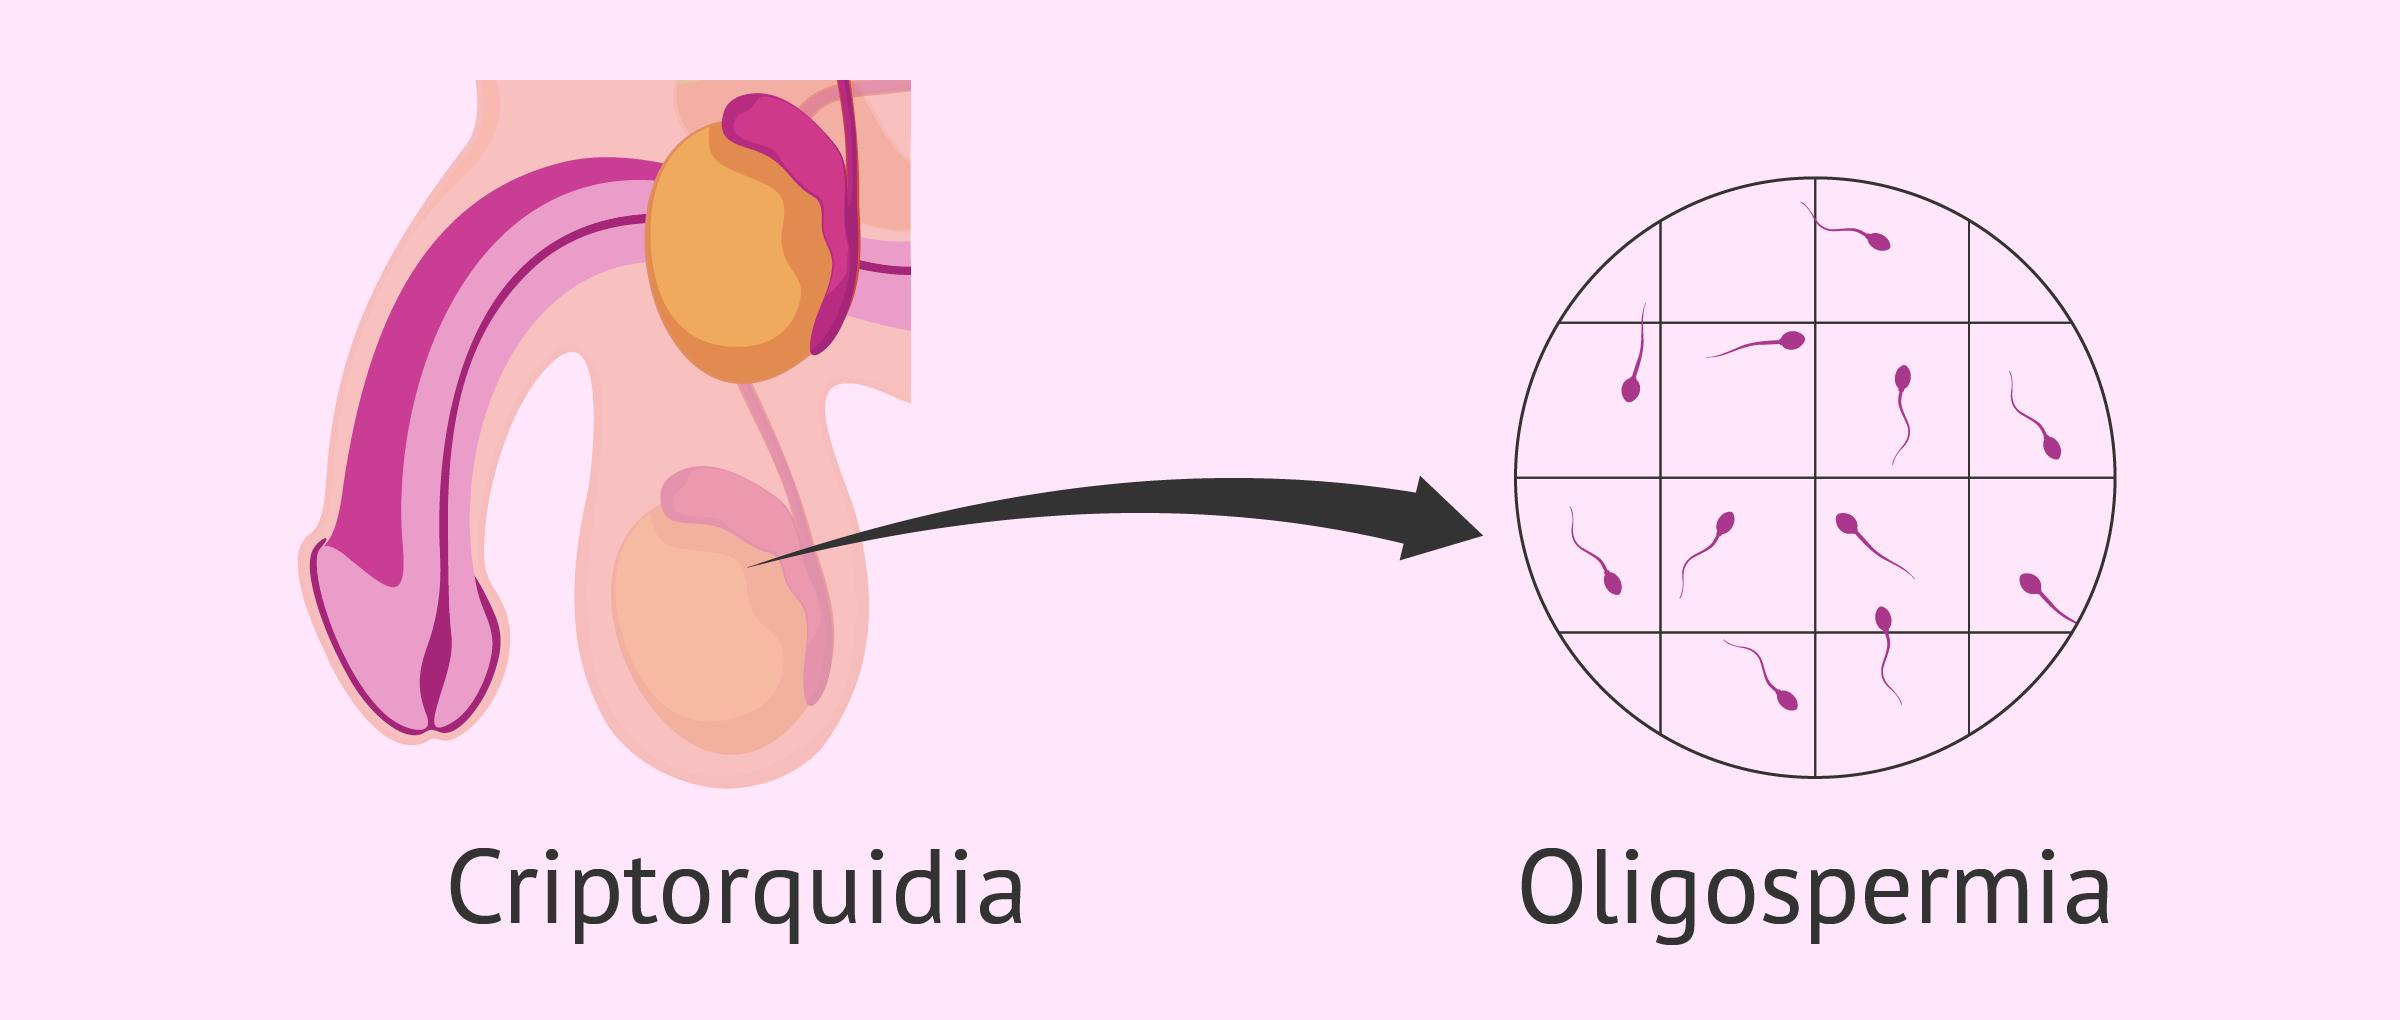 Oligospermia y criptorquidia